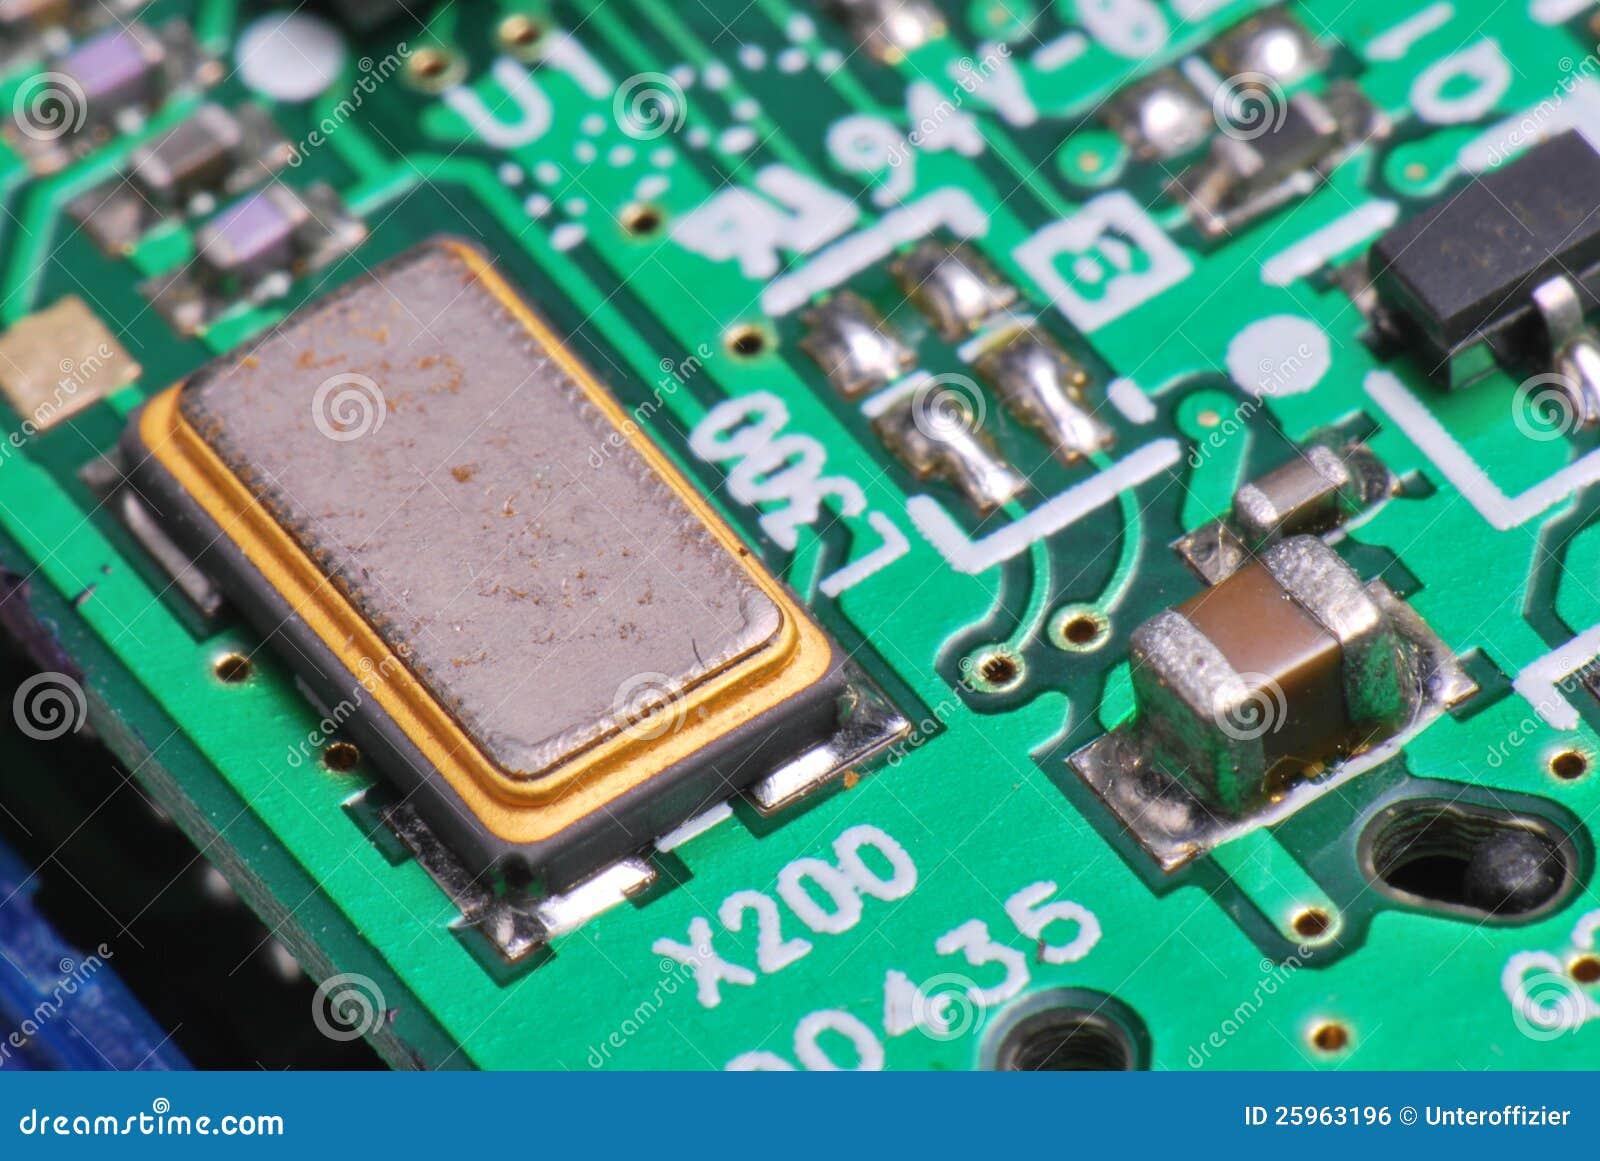 Printed Circuit Board stock photo  Image of electronics - 25963196